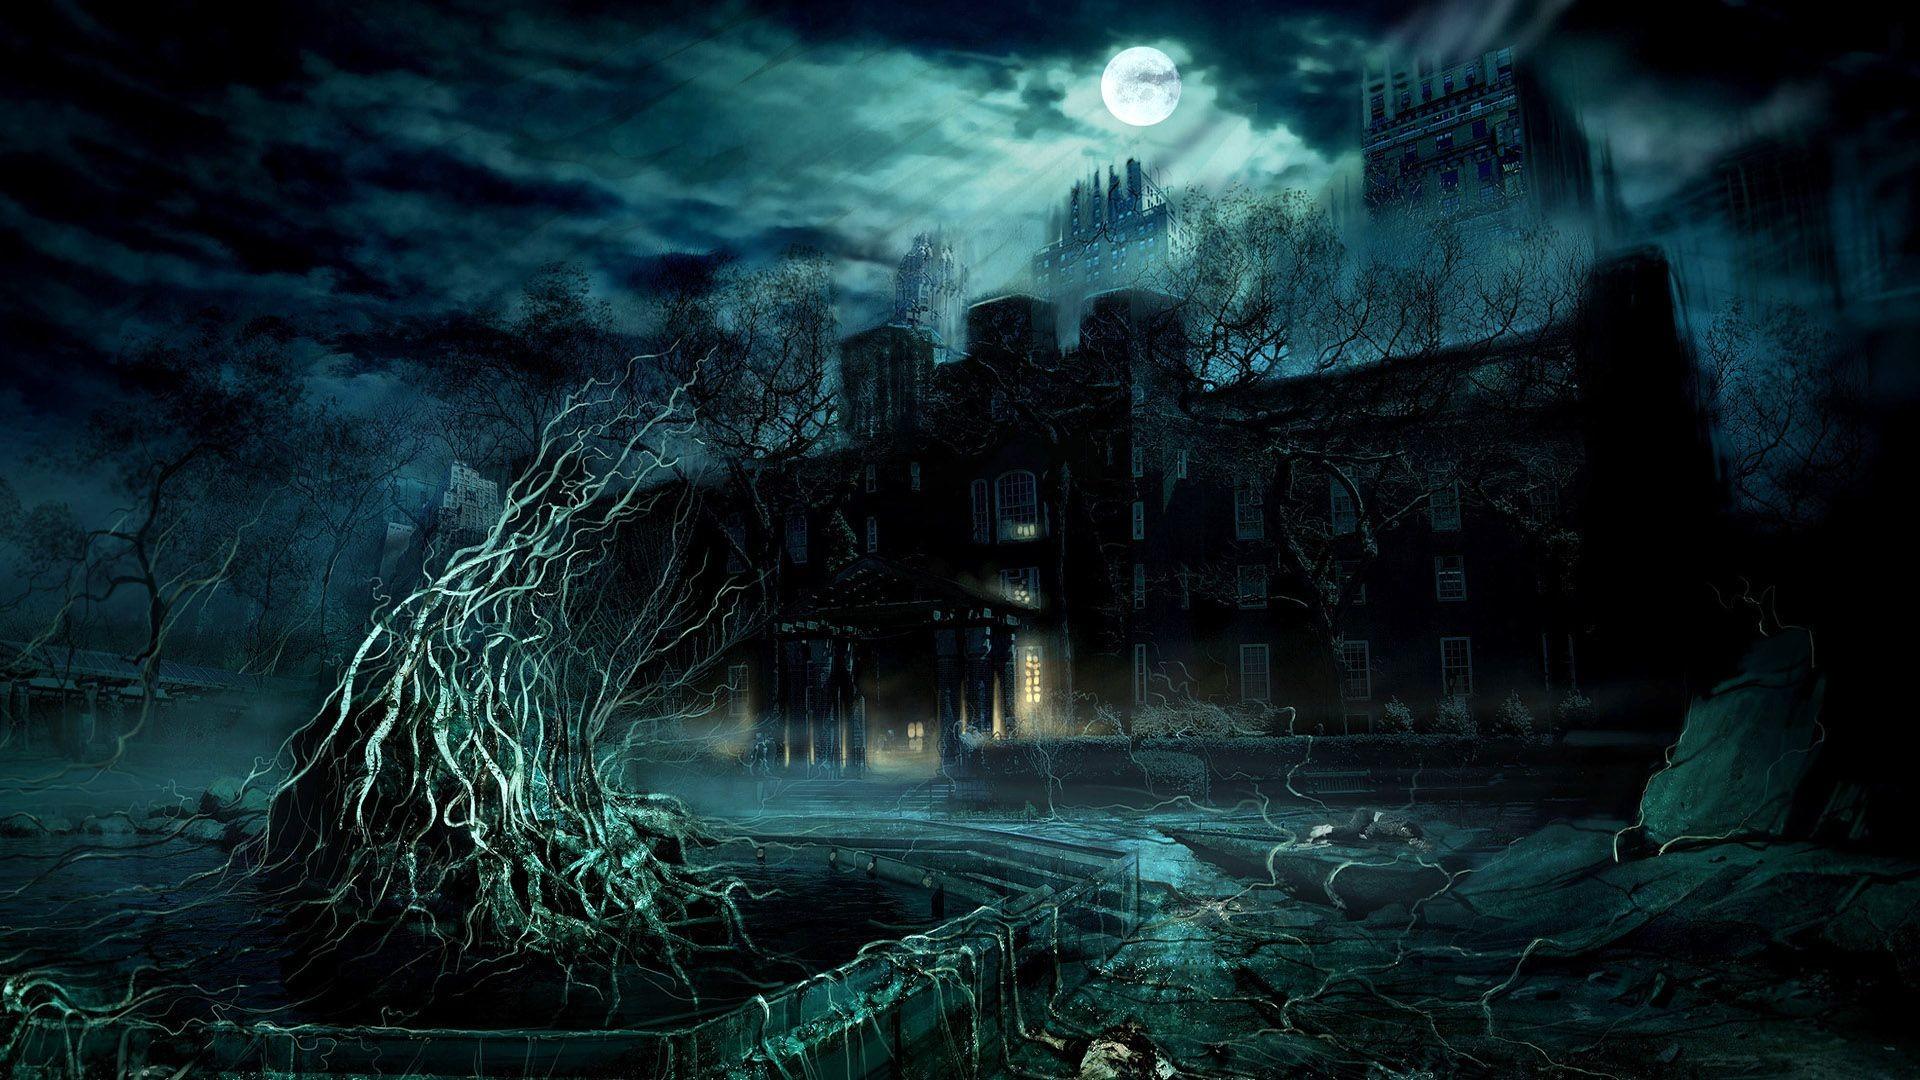 Dark Fantasy Wallpaper Magic Horse 1680×1050. Dark Game Scene HD